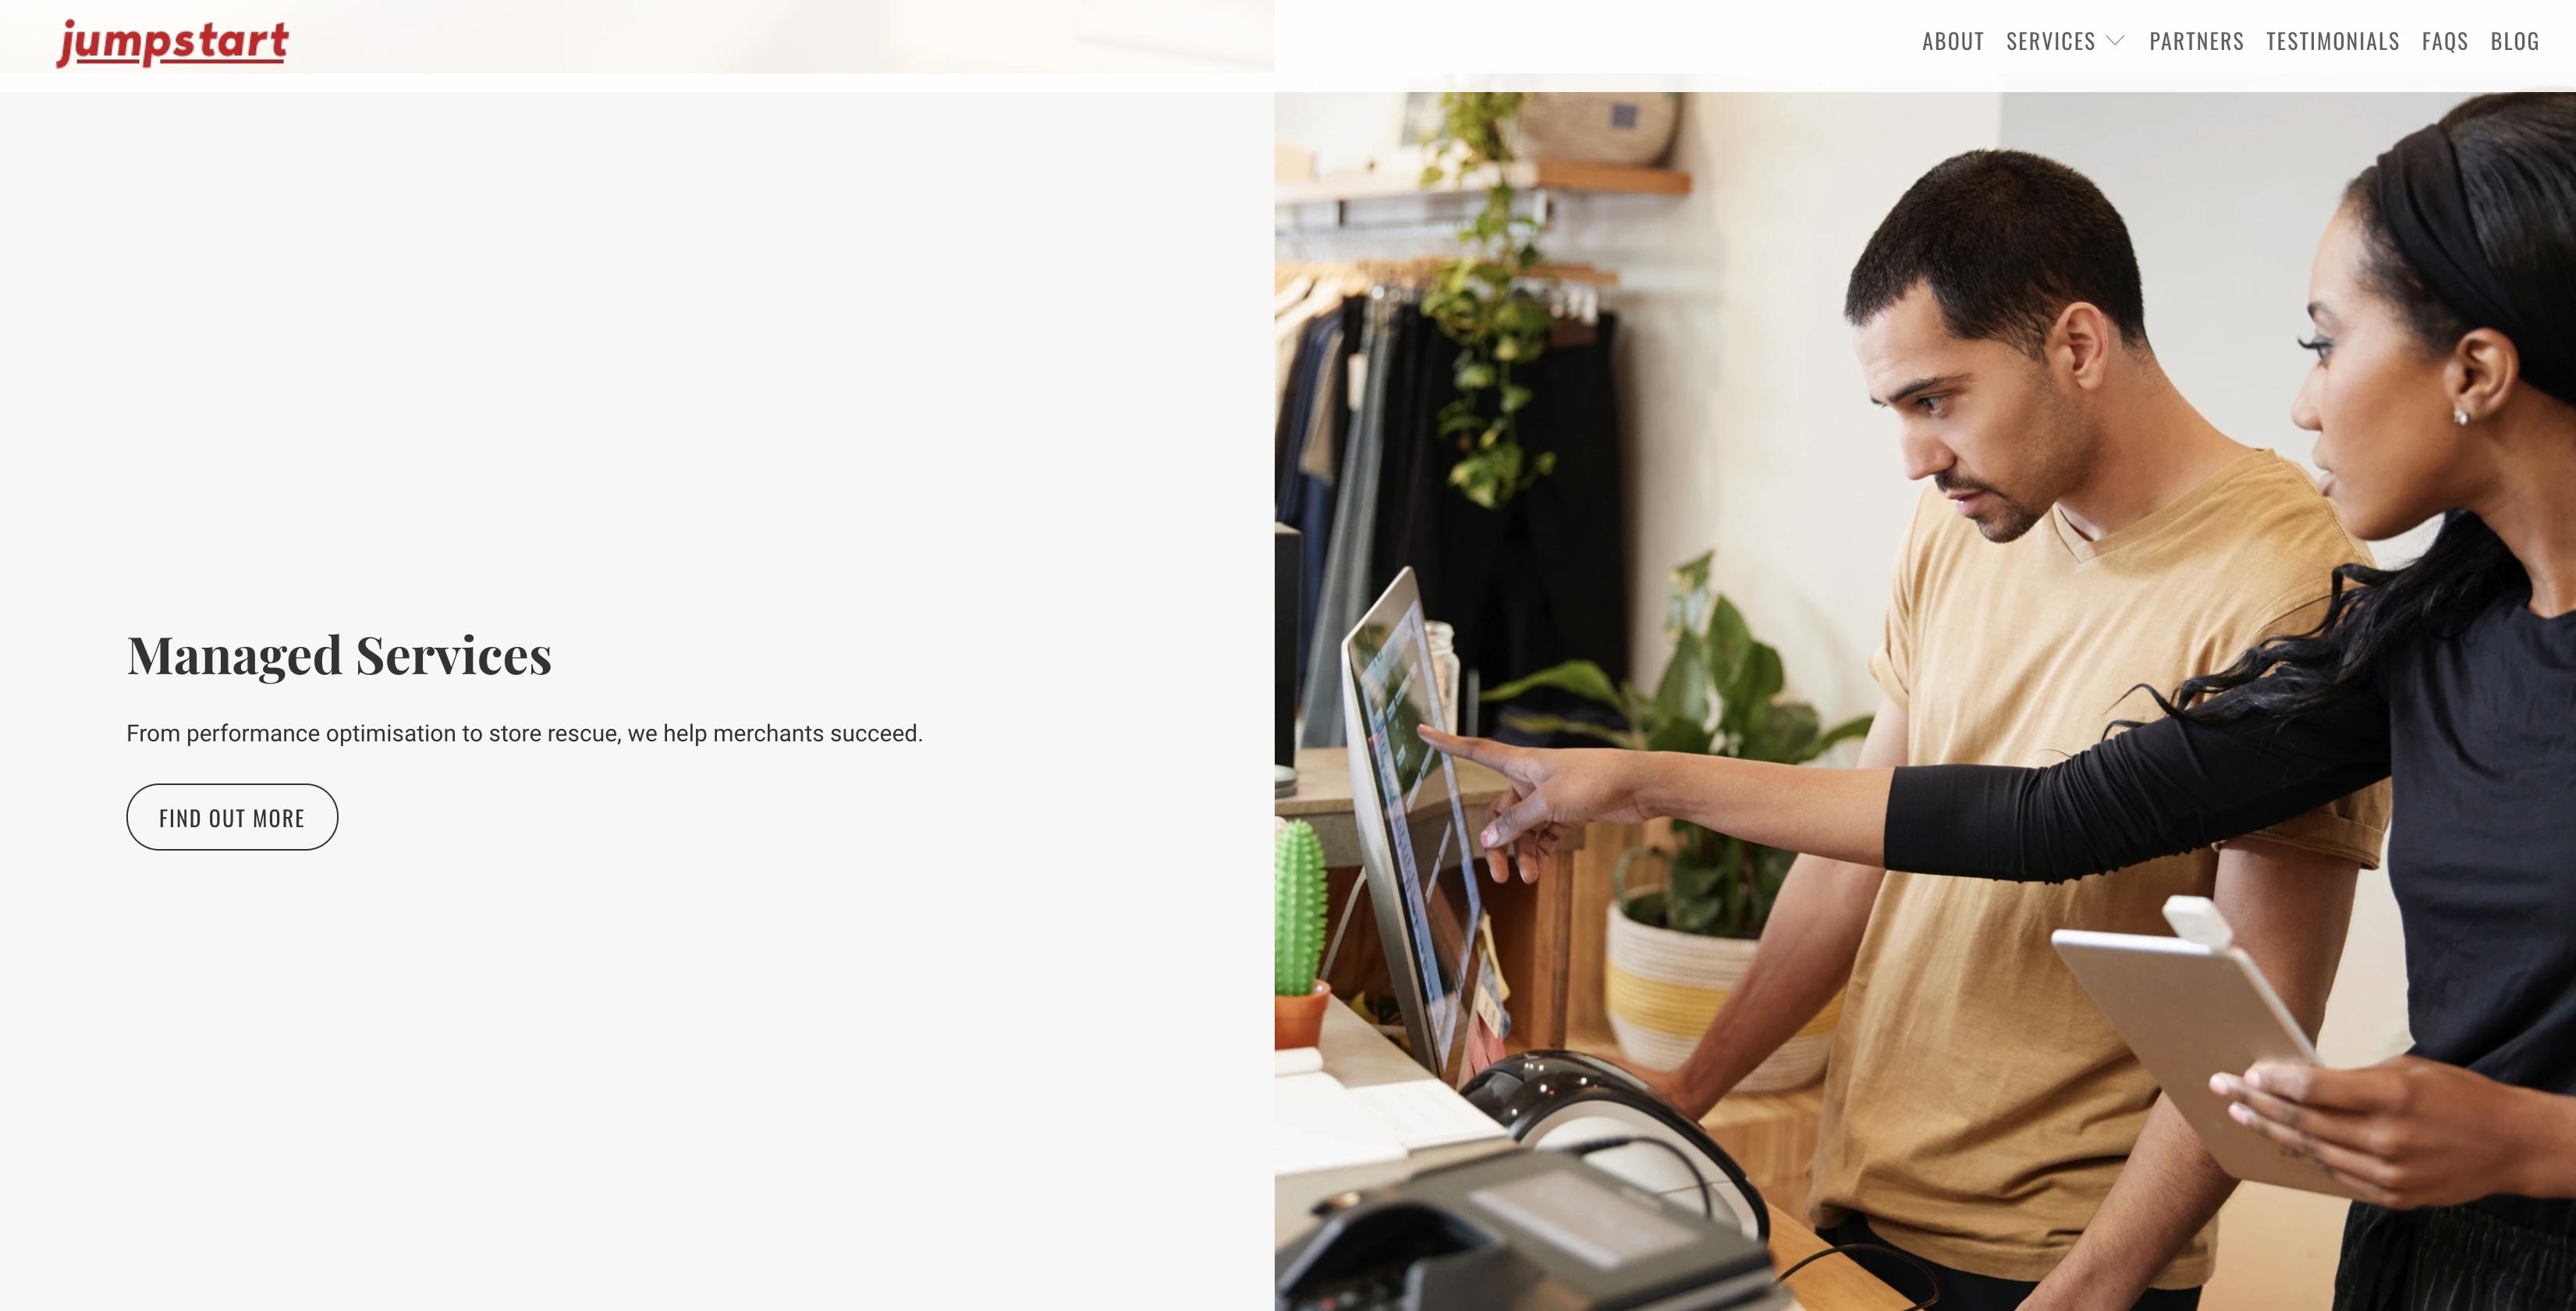 Shopify 合作伙伴 Jumpstart 是如何帮助众多品牌迈向国际的?